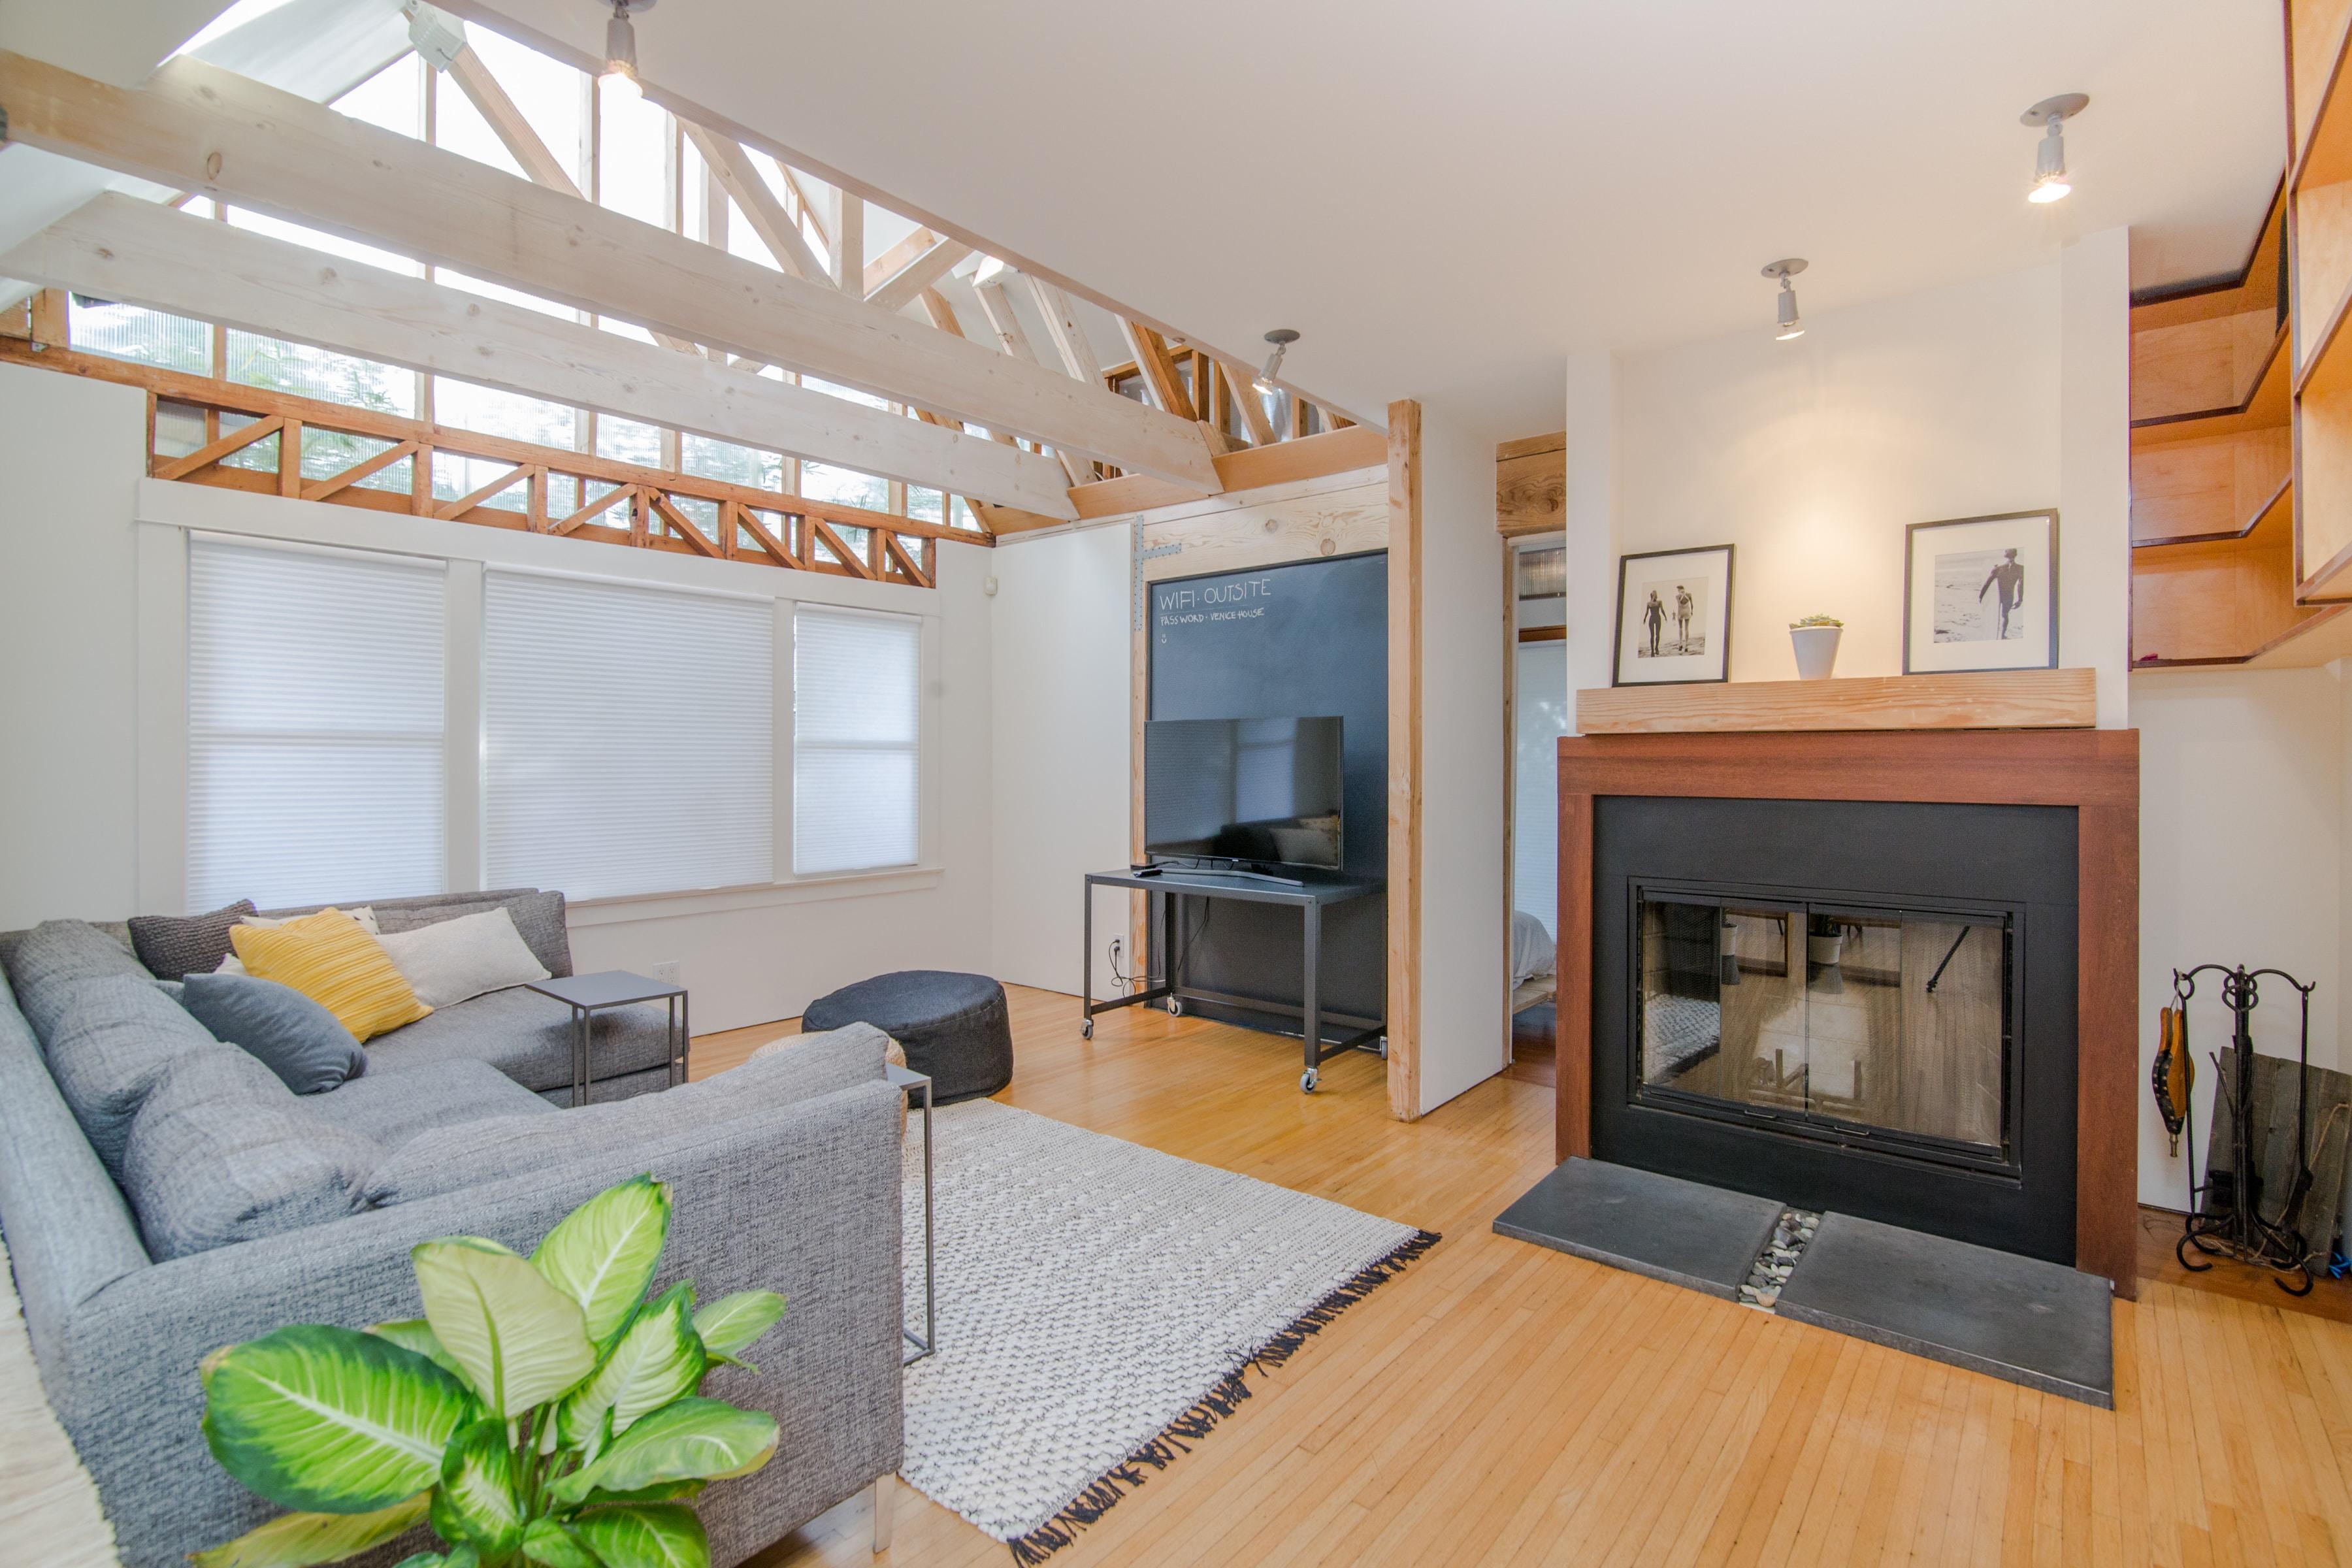 Interior of home with no indoor pollutants